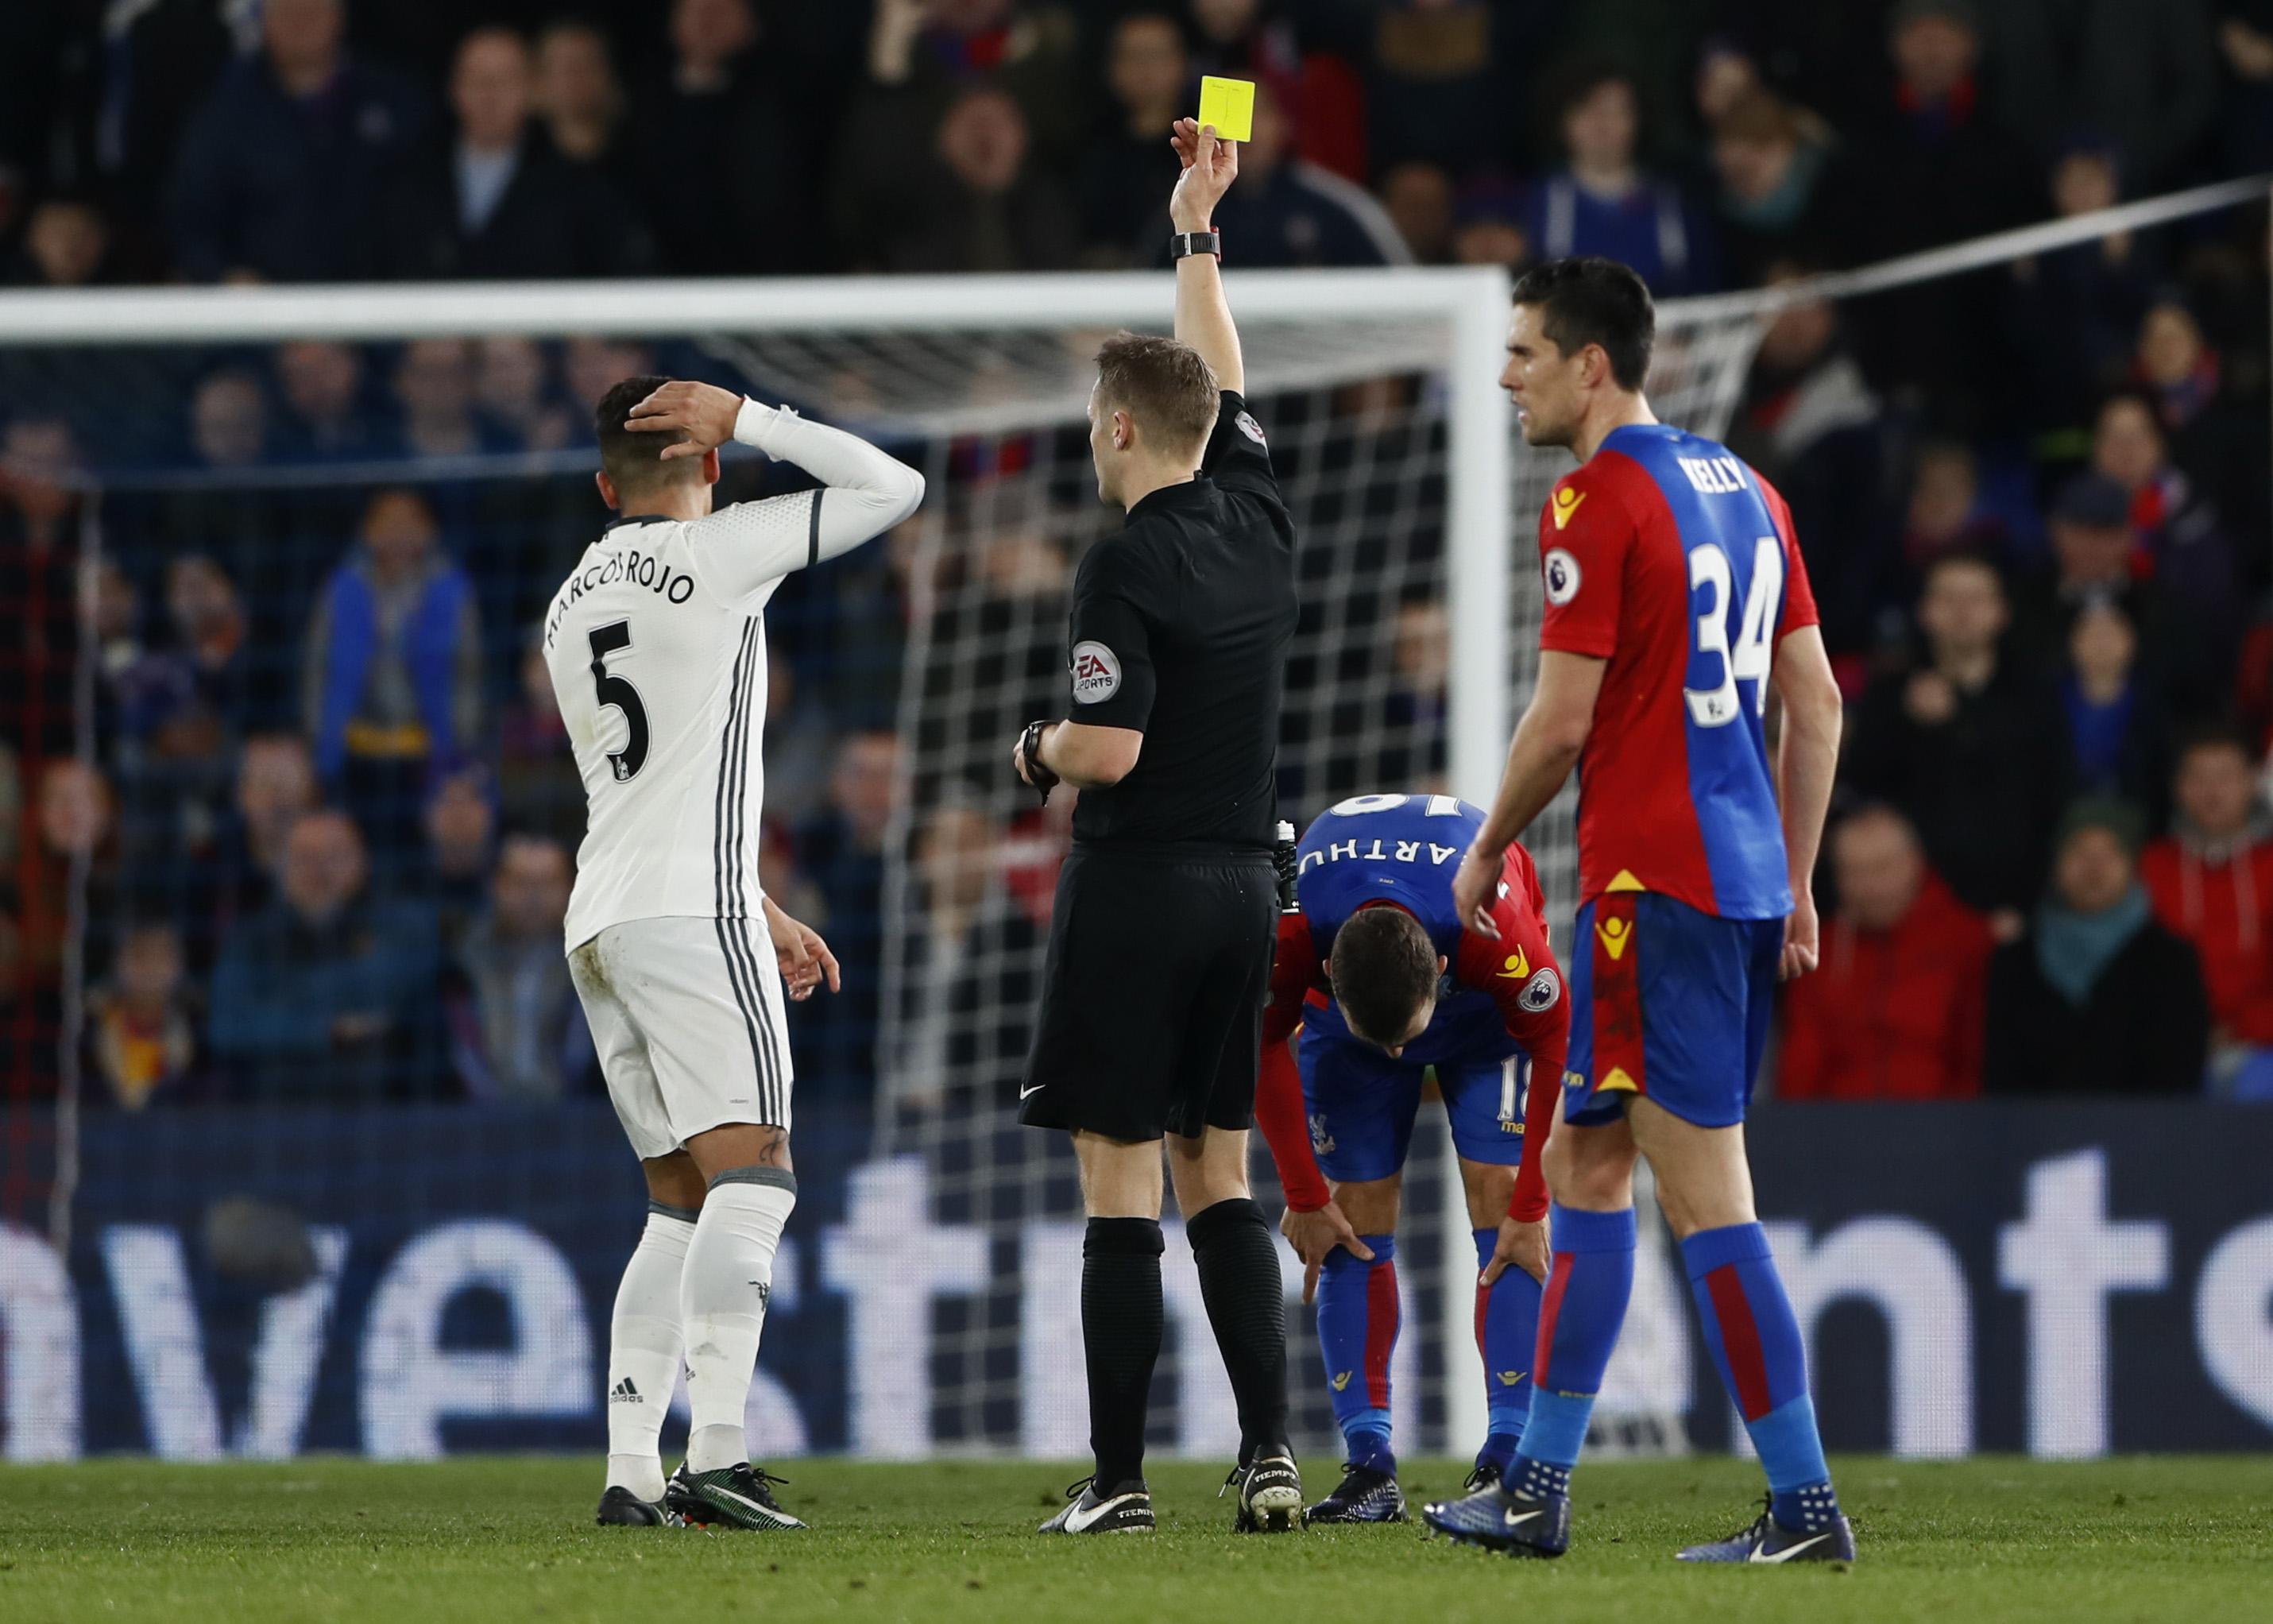 Mourinho defends 'clean' Rojo after Pardew criticism